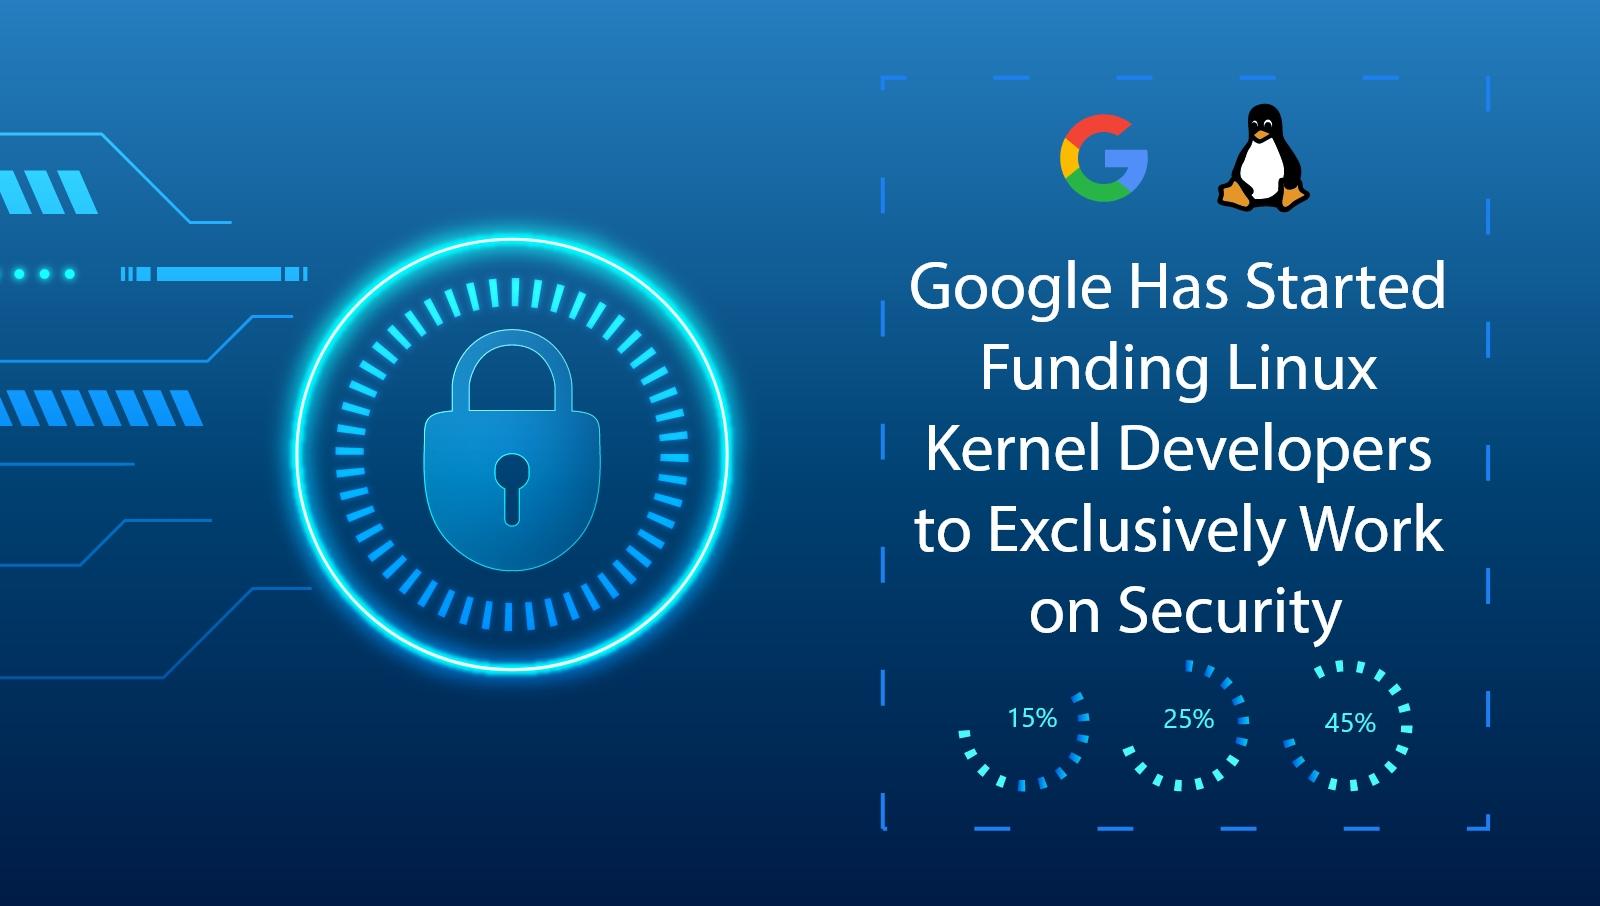 Google-Has-Started-Funding-Linux Kernel-Developers